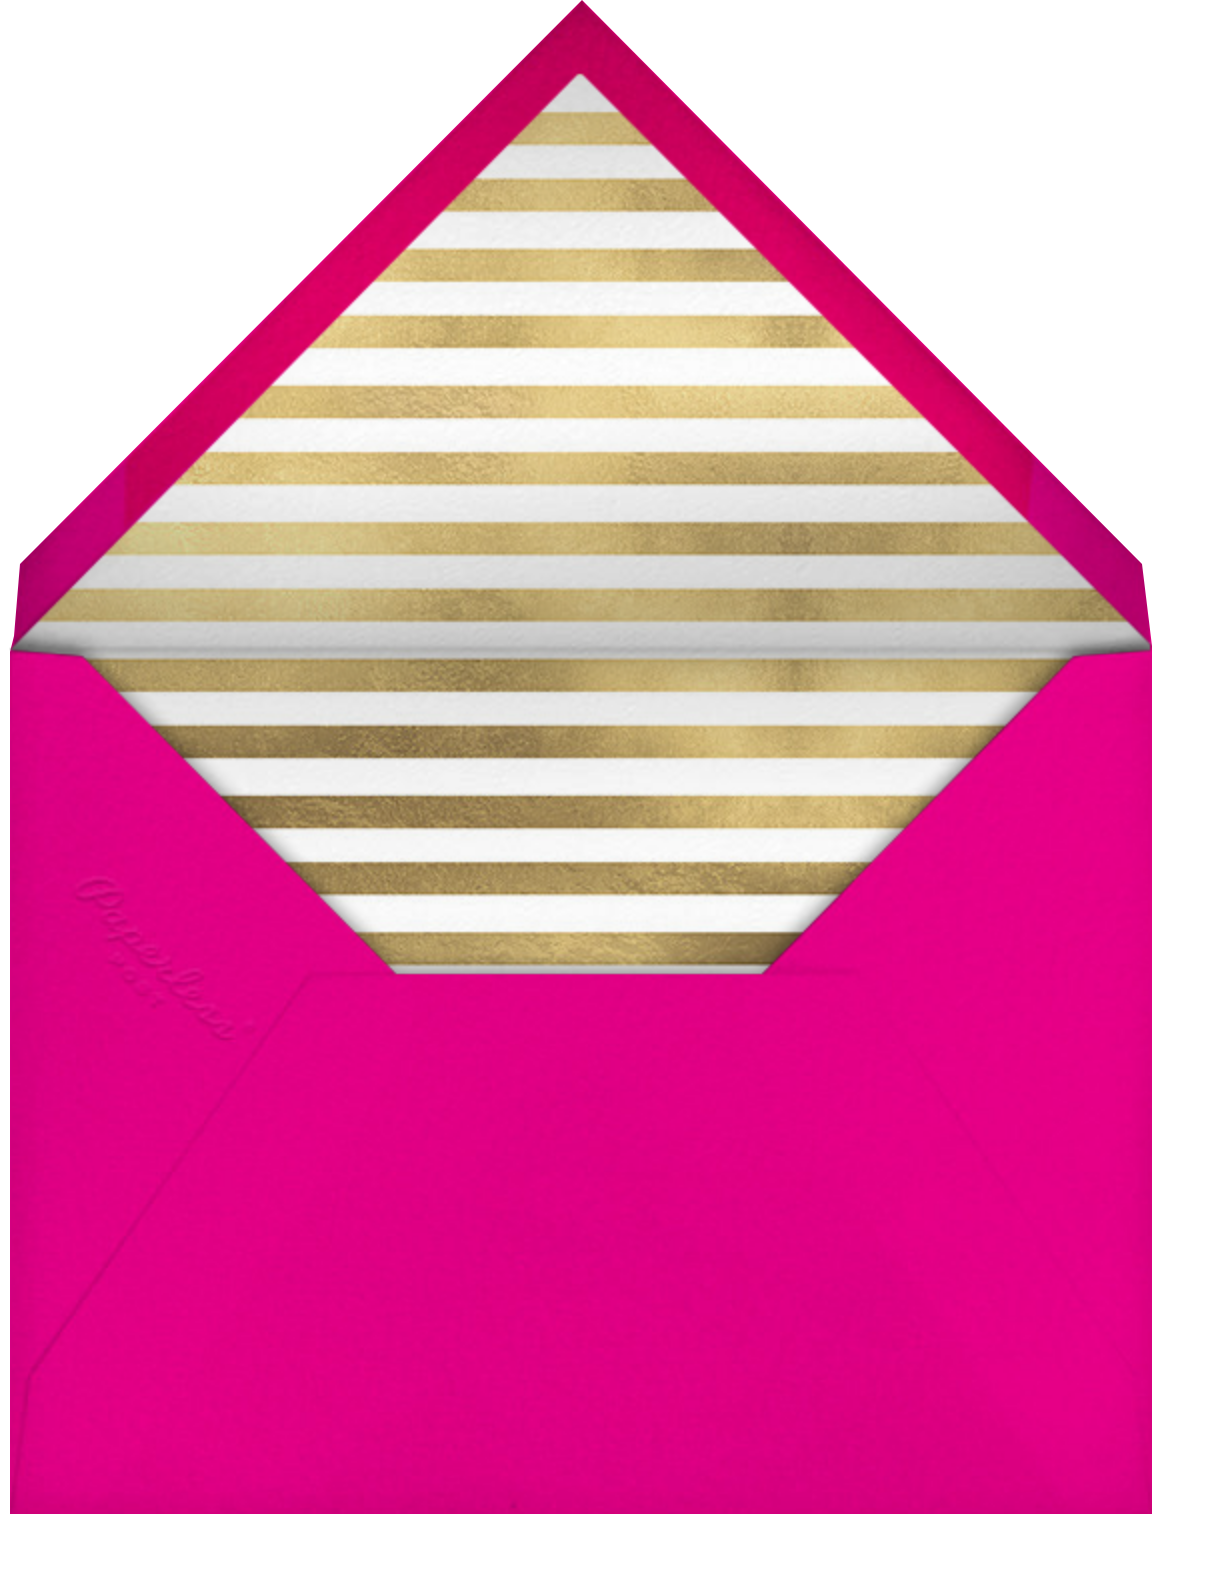 Warm Wishes - kate spade new york - Envelope